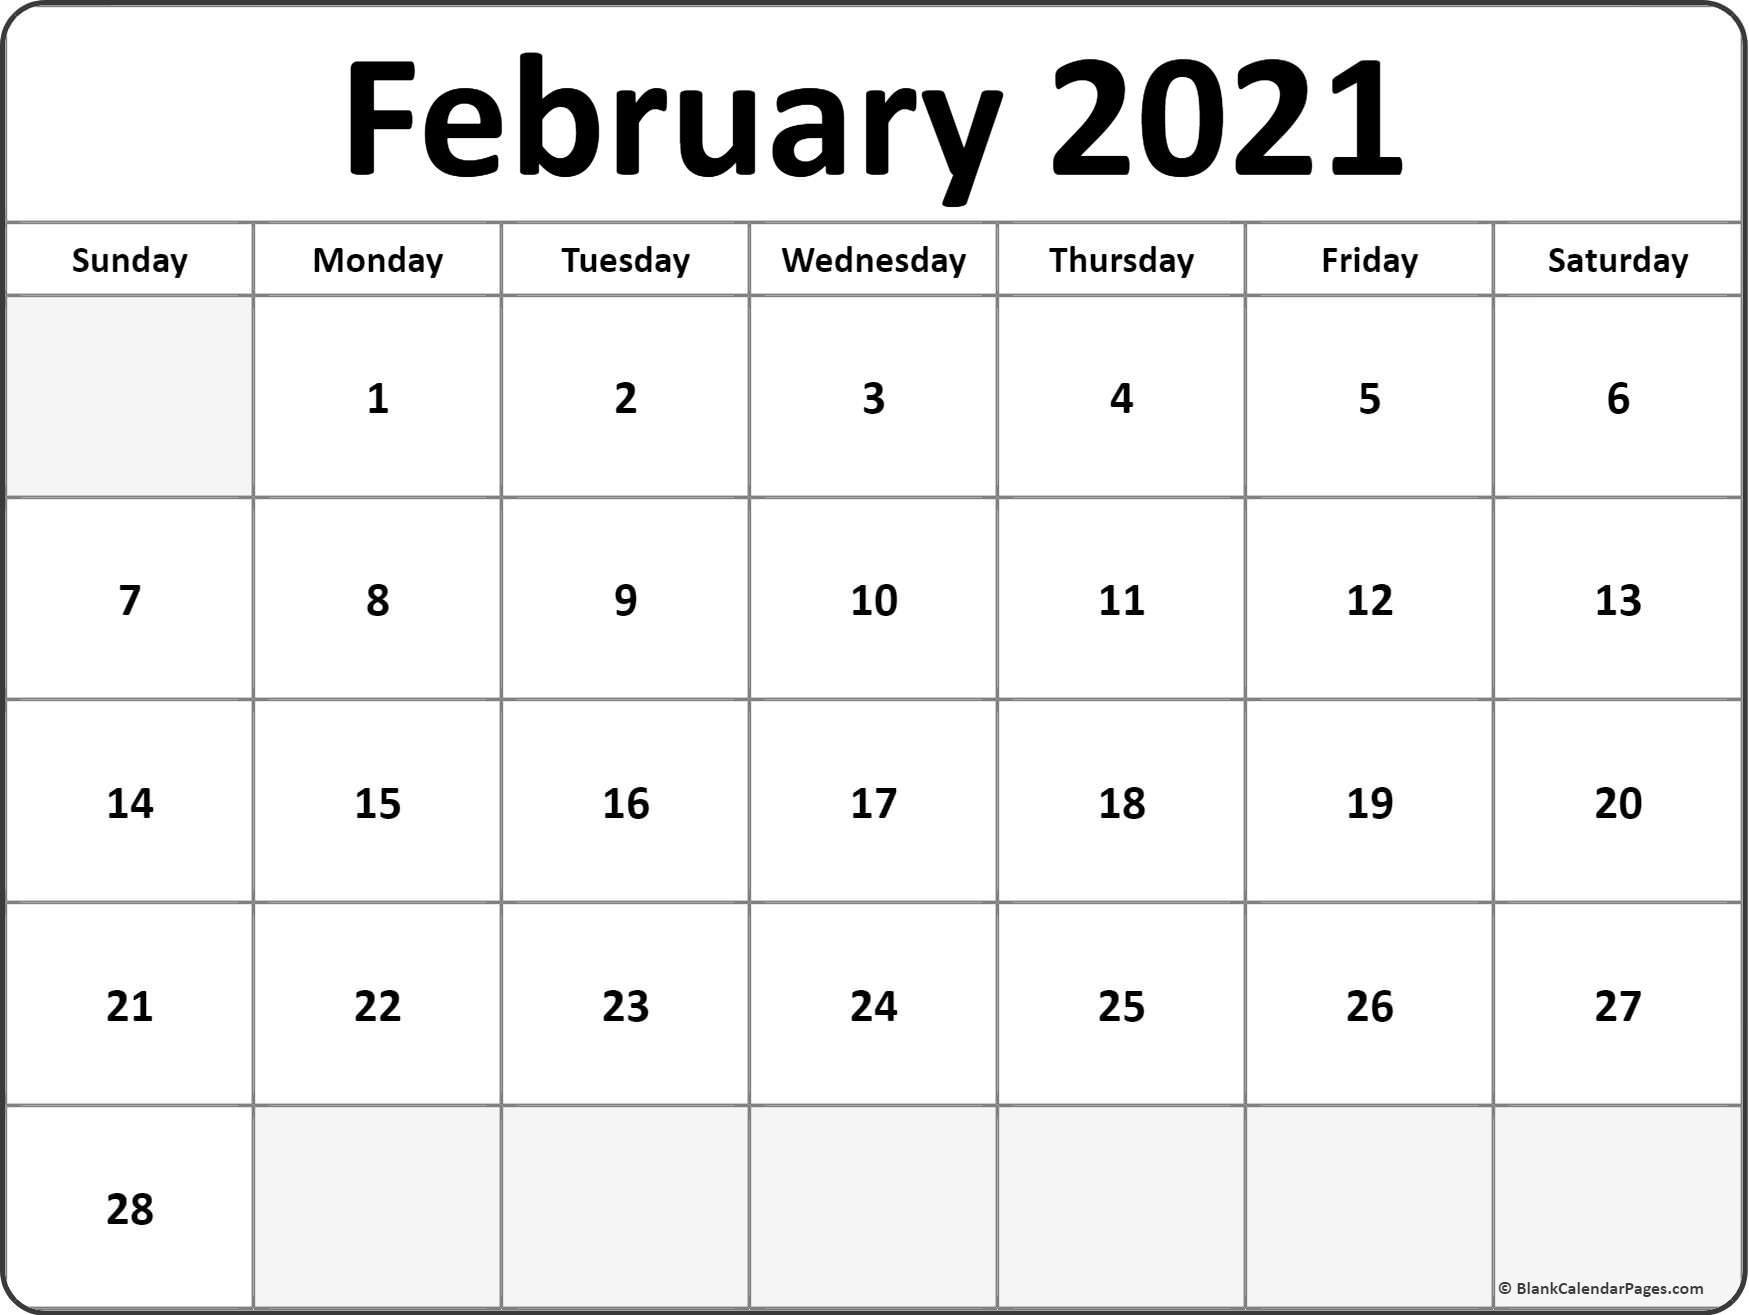 Calendar February 2021 Editable Planner   Free Printable  Blank 2021 2021 Calendar Template